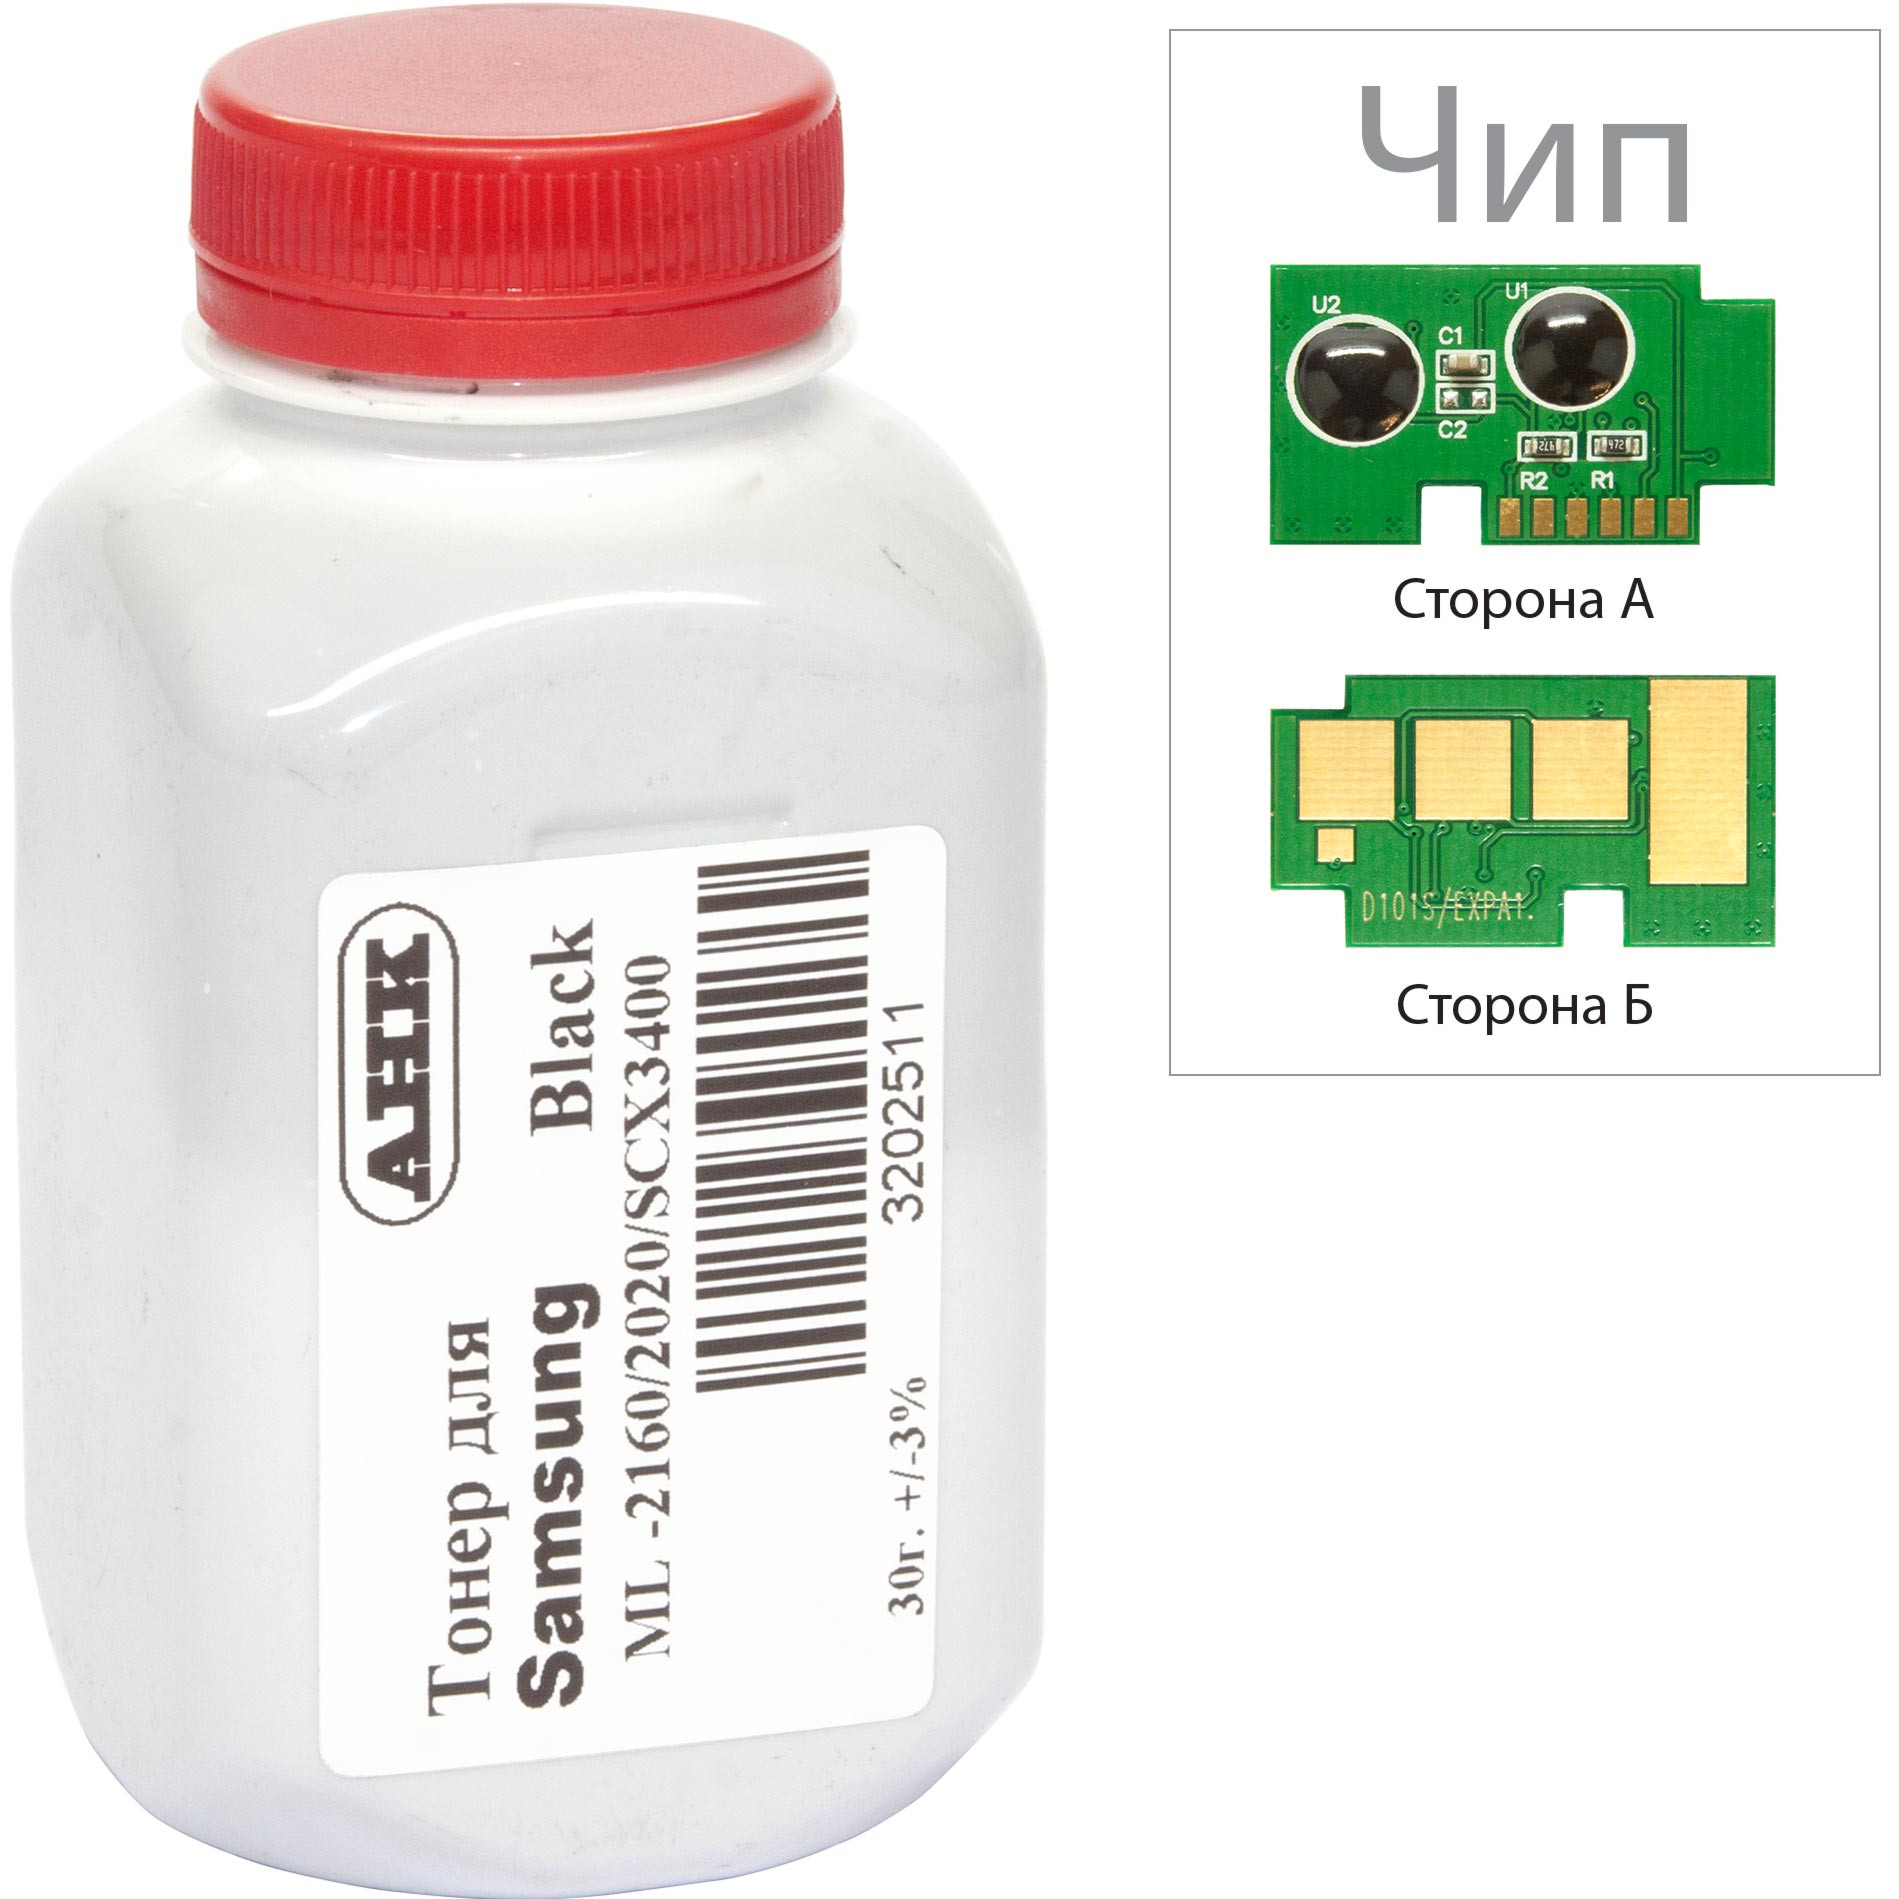 Купить Тонер + чіп АНК for Samsung ML-2160/2165/SCX-3400 Black бутль 30g, 3202677, AHK